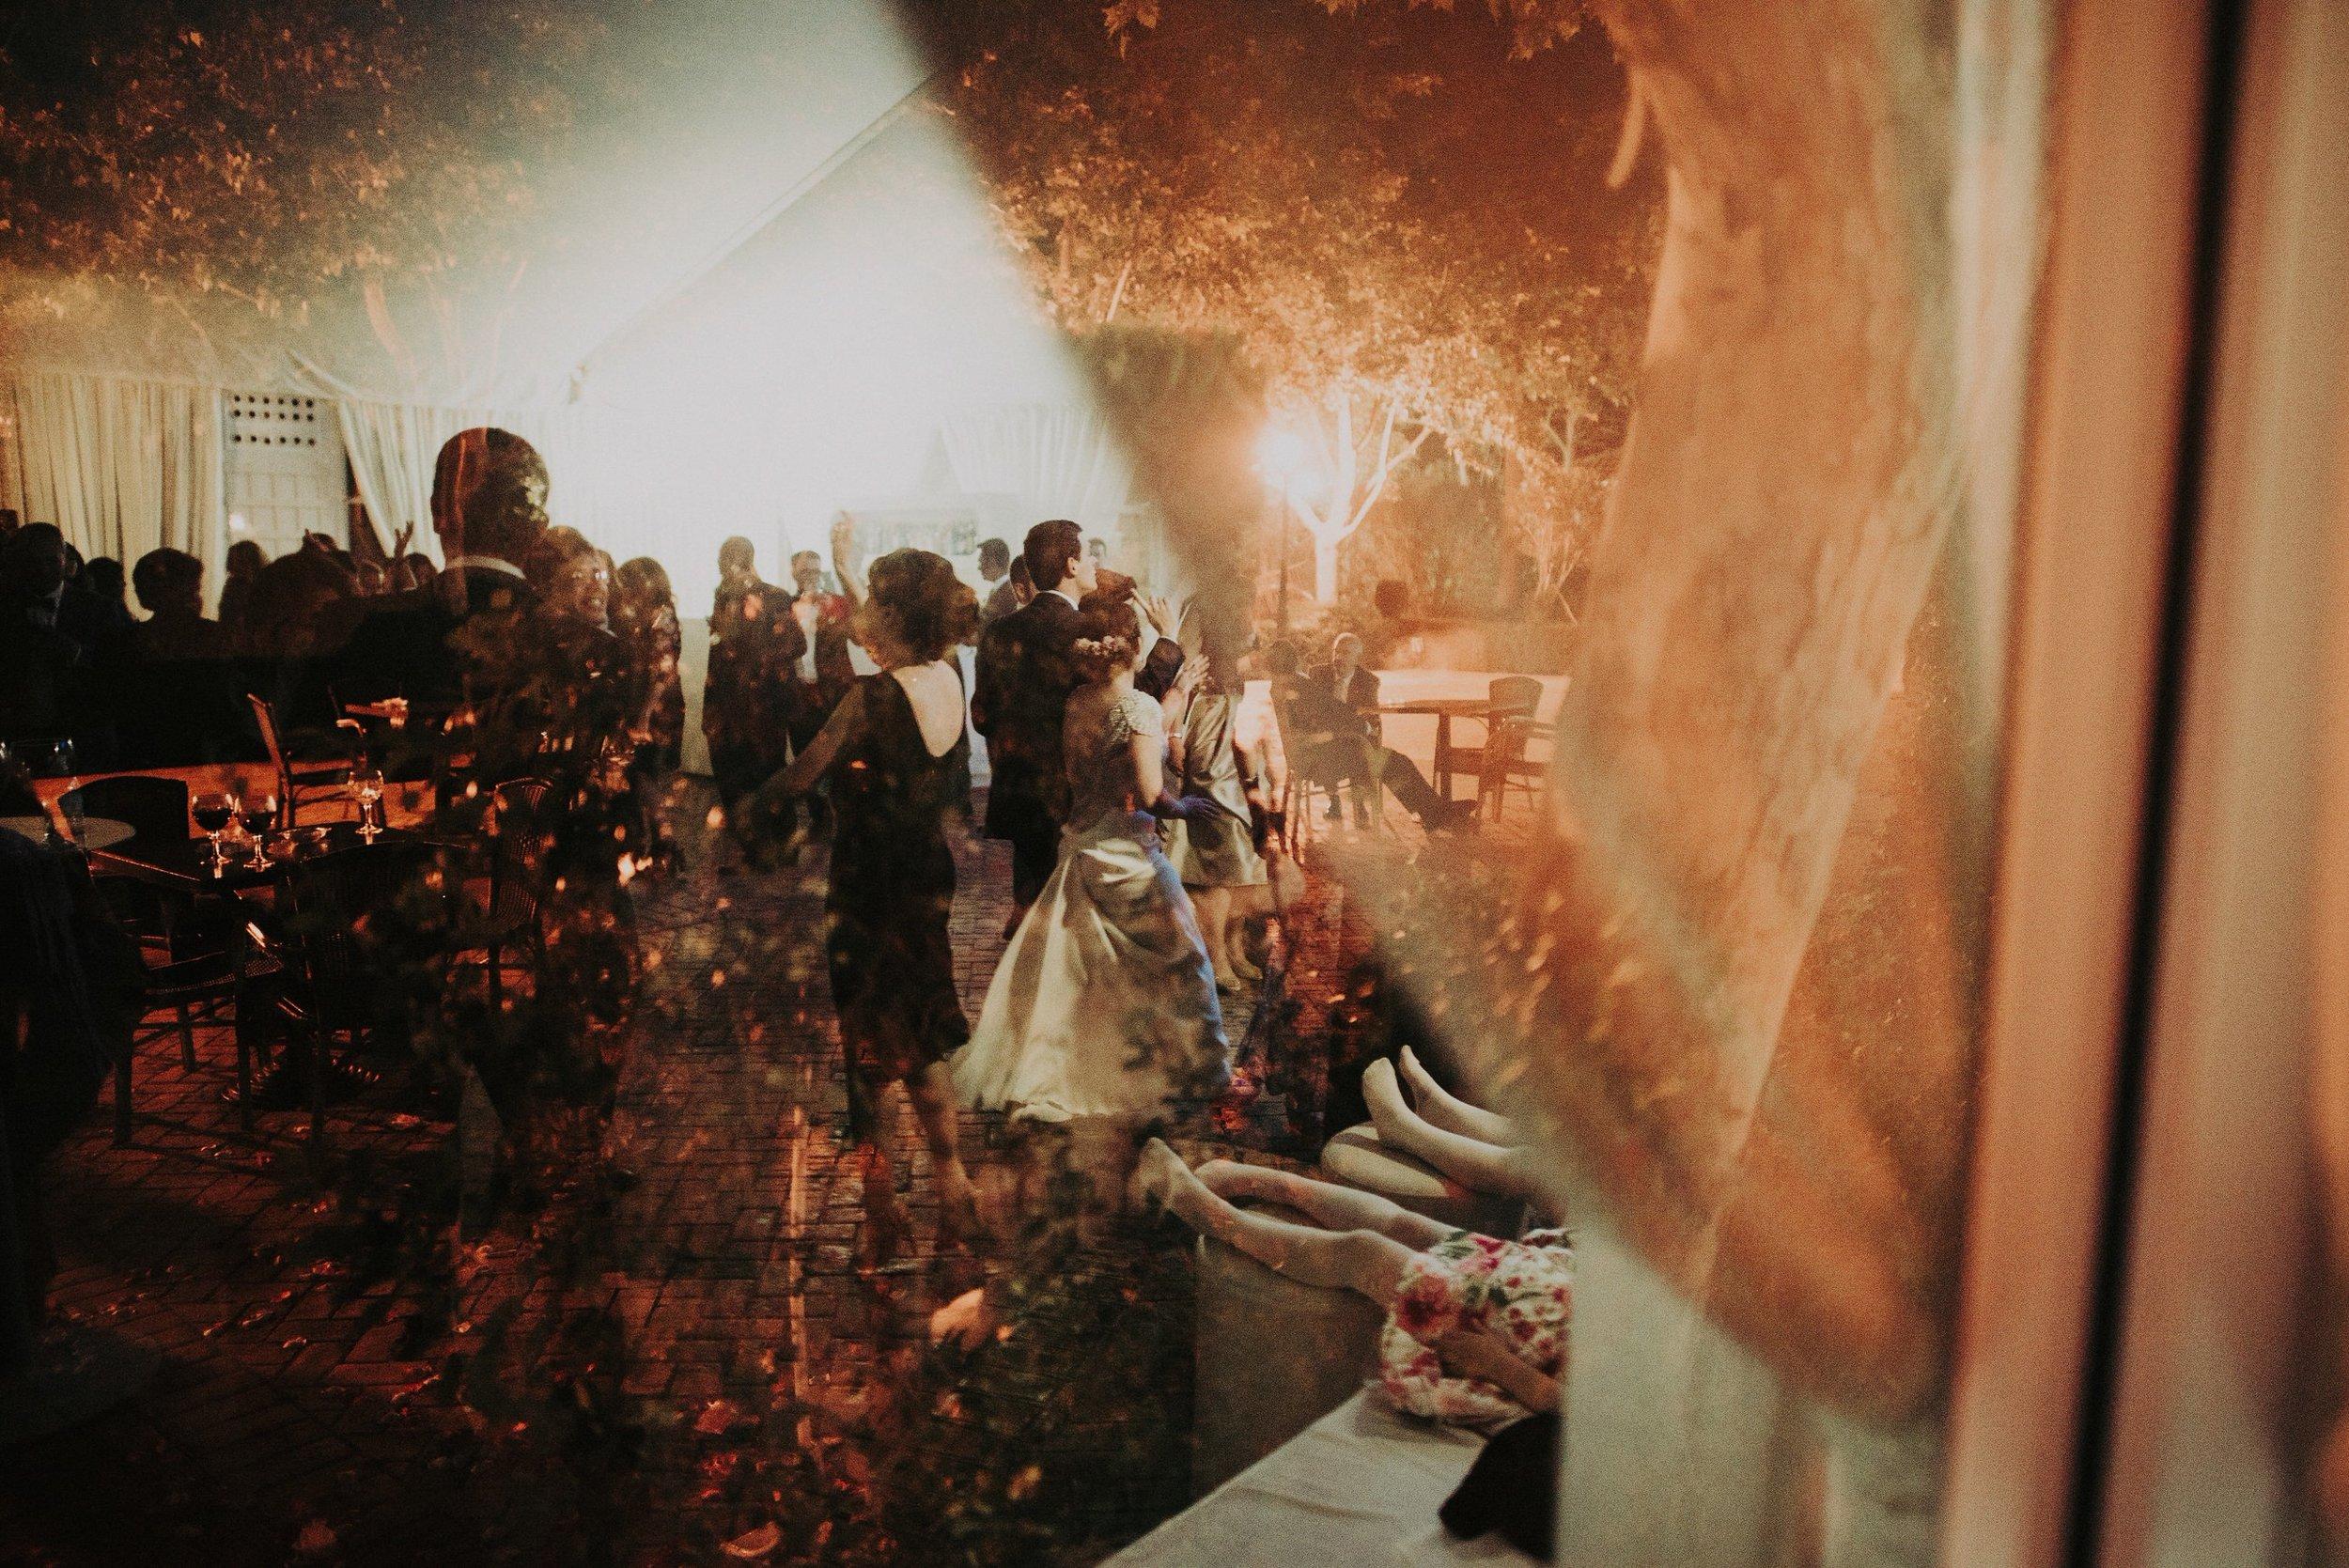 Laura & Rubén - boda en utrera - Santa clotilde- Manolo mayo - Fotografo de boda - Andrés Amarillo AAA_1075-Exposure (51).jpg